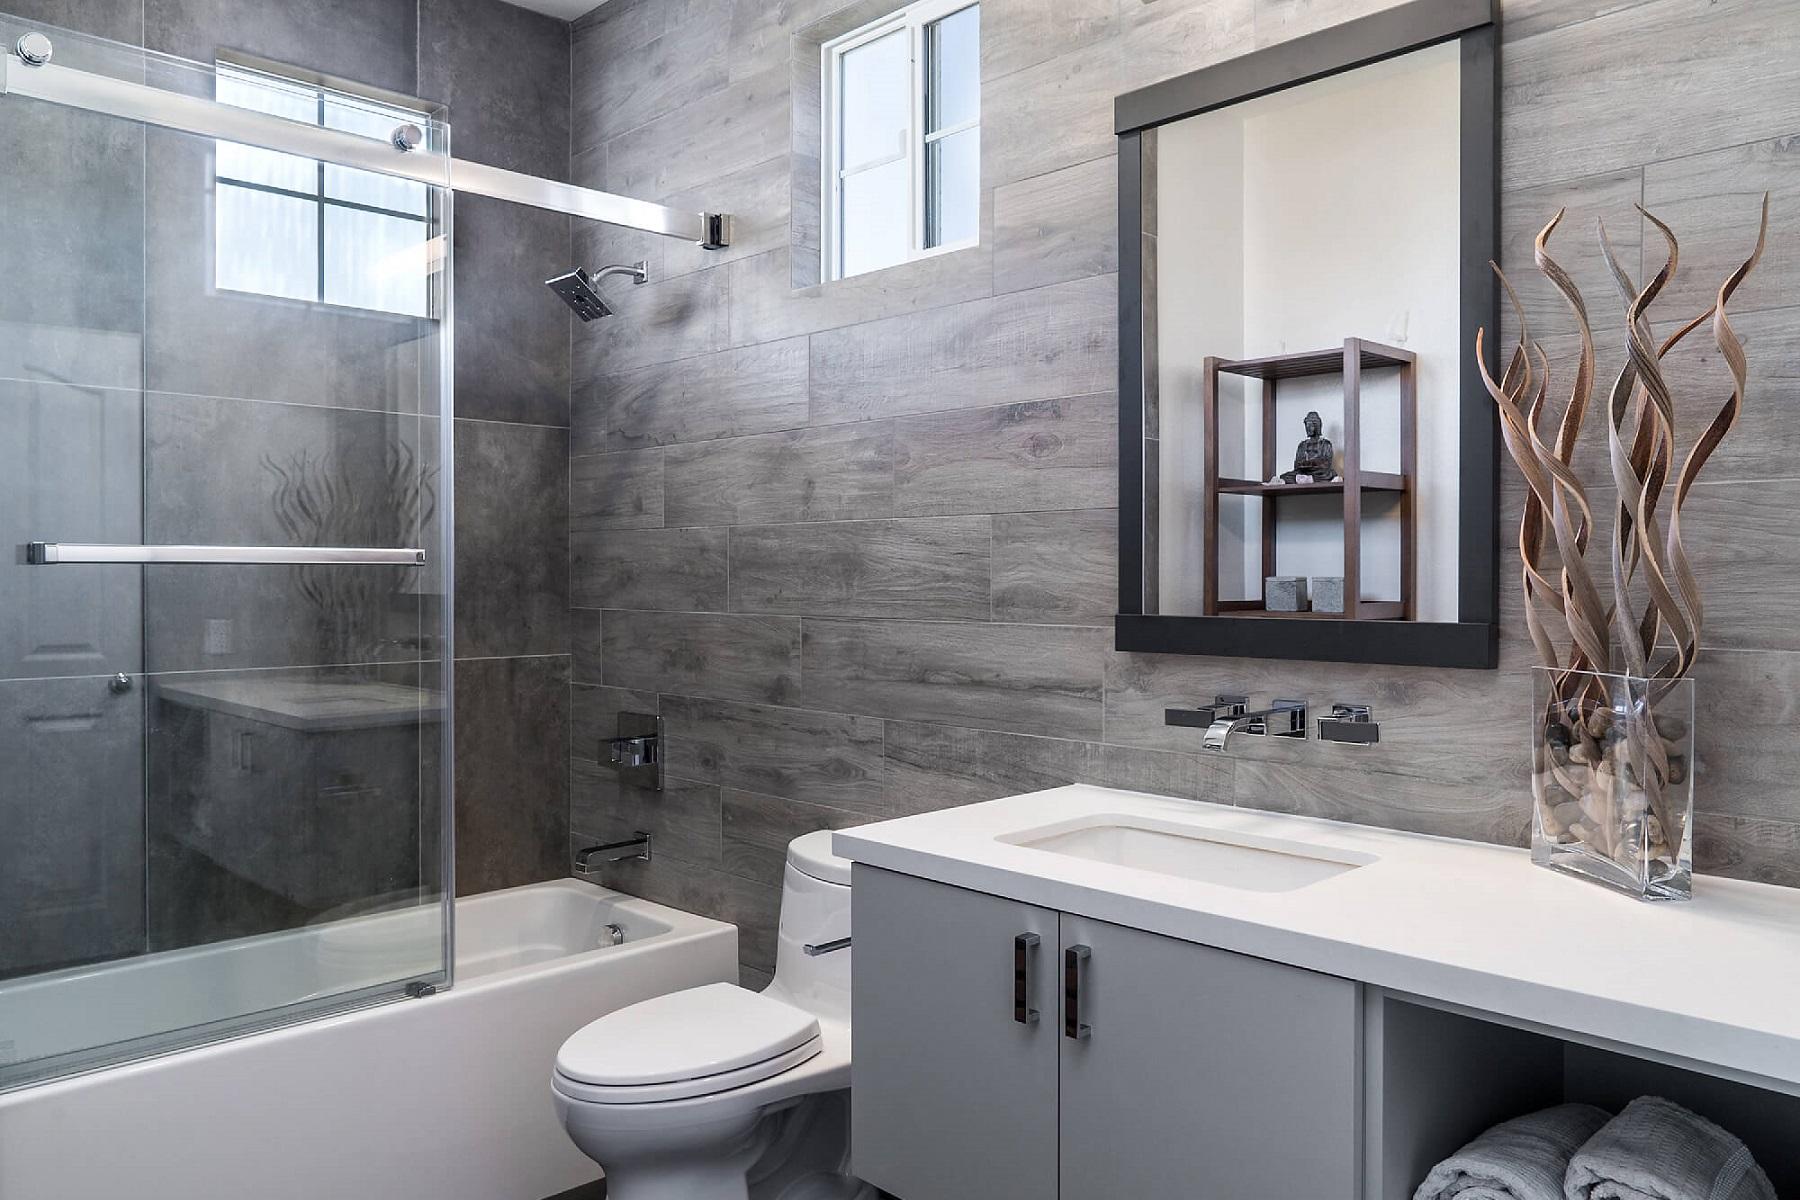 Choosing A Bathroom Remodel Idea